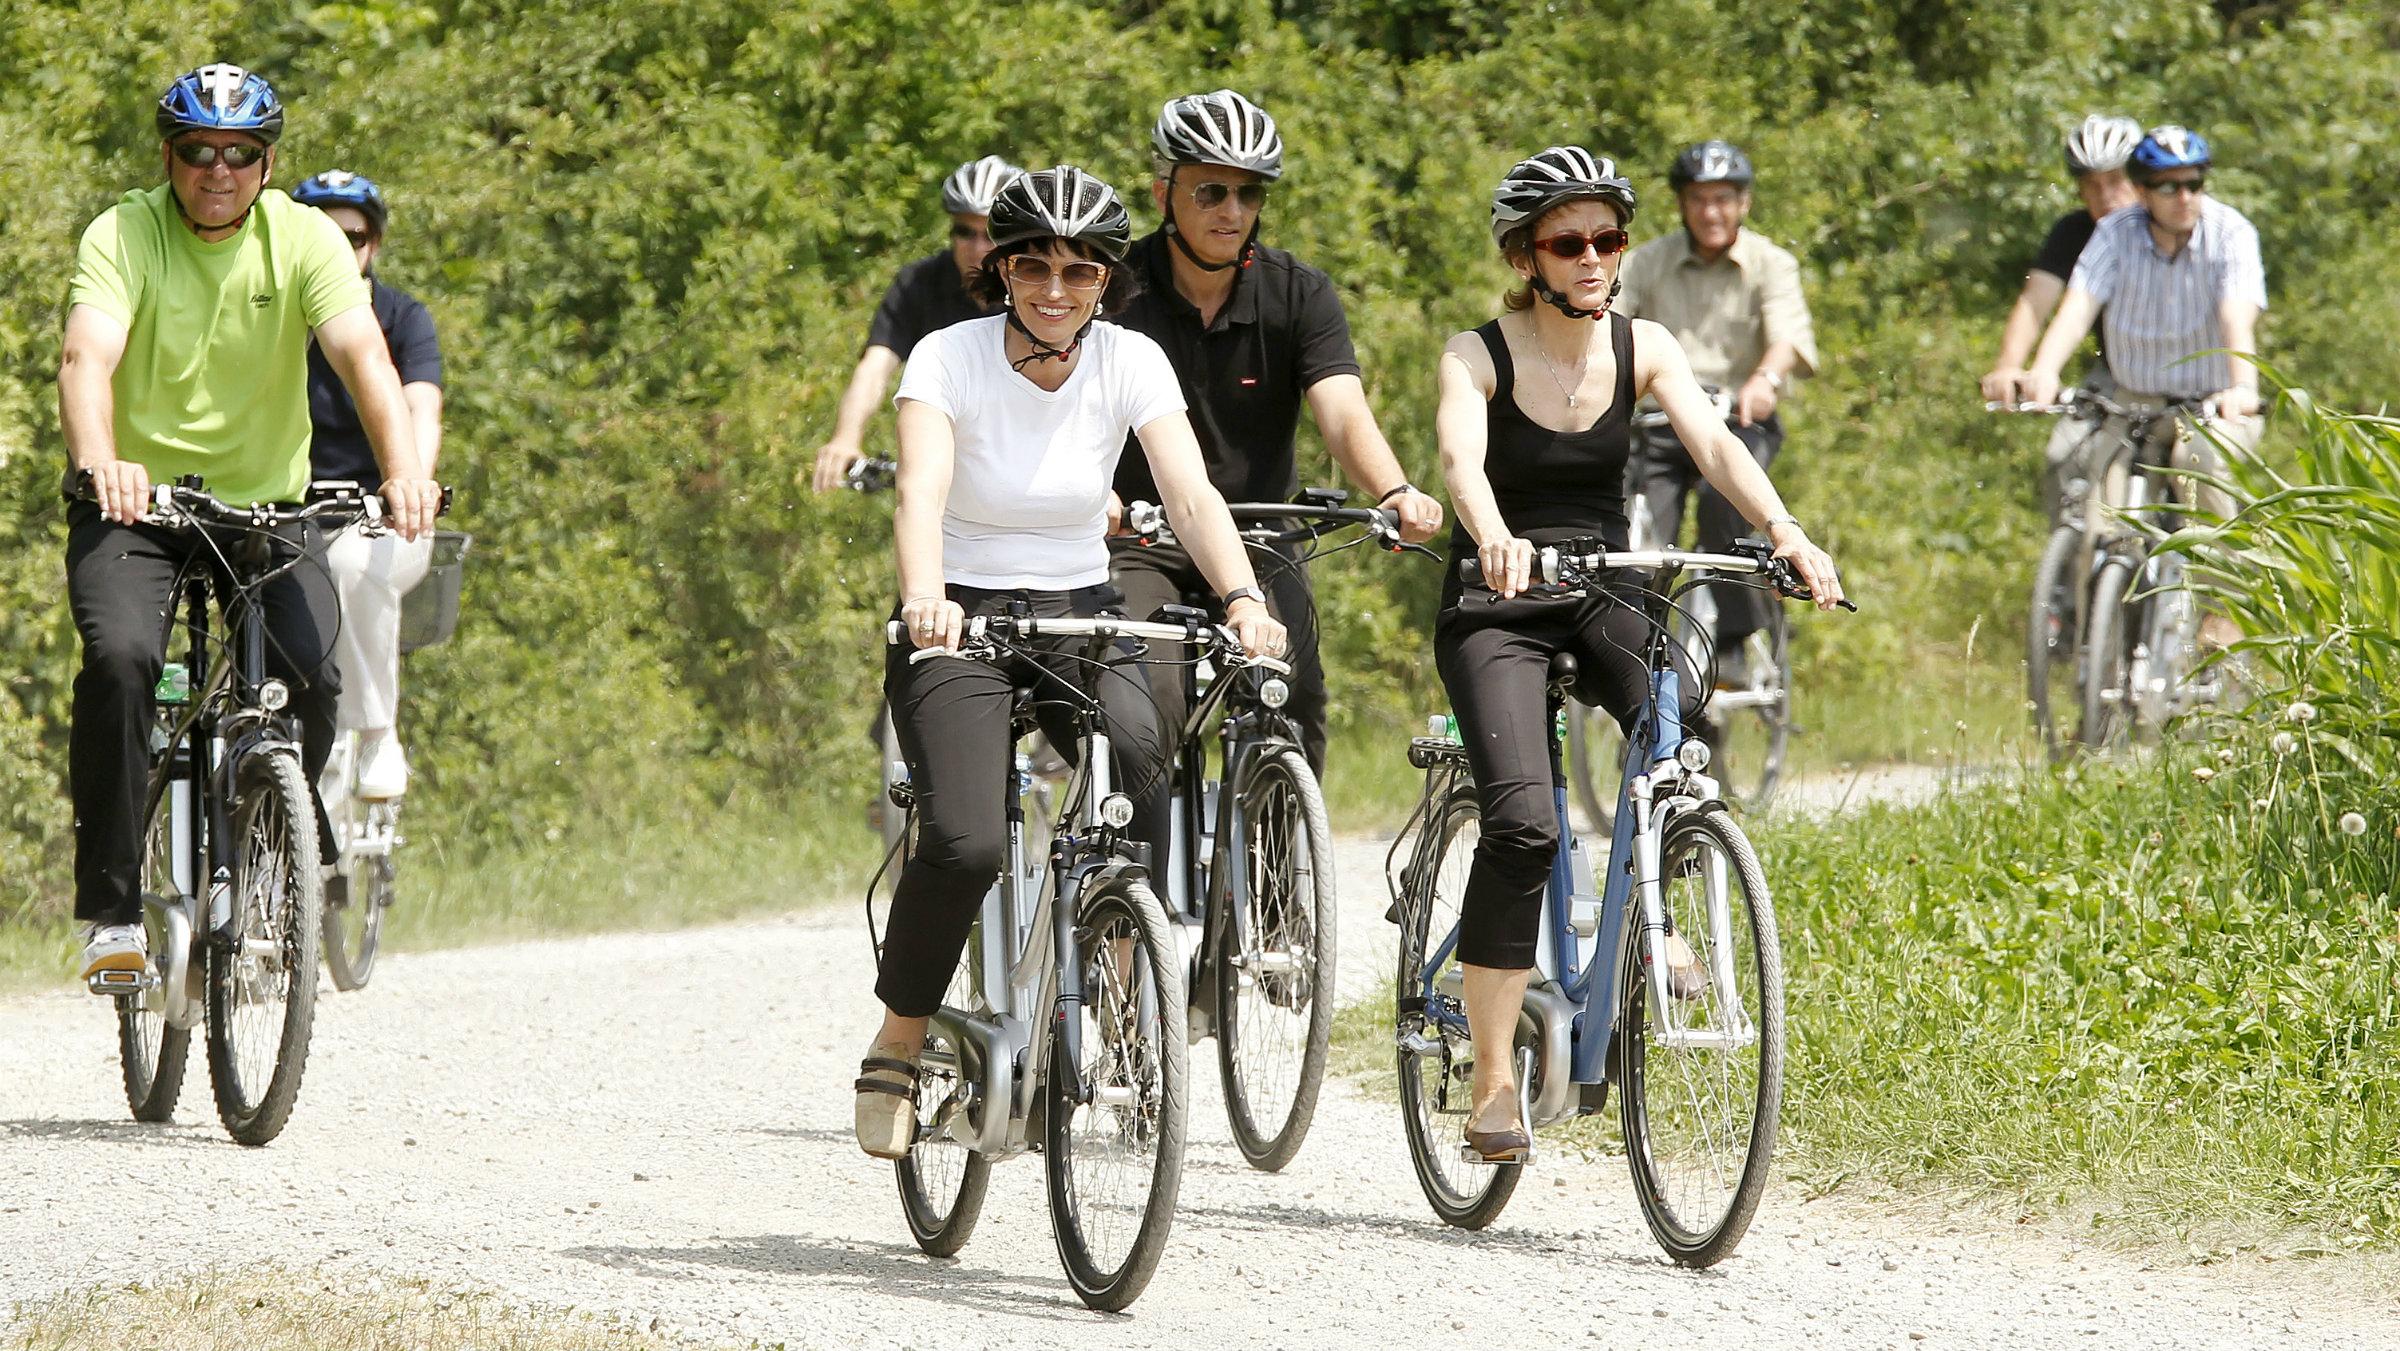 Swiss President Doris Leuthard and others ride e-bikes near Zurich.